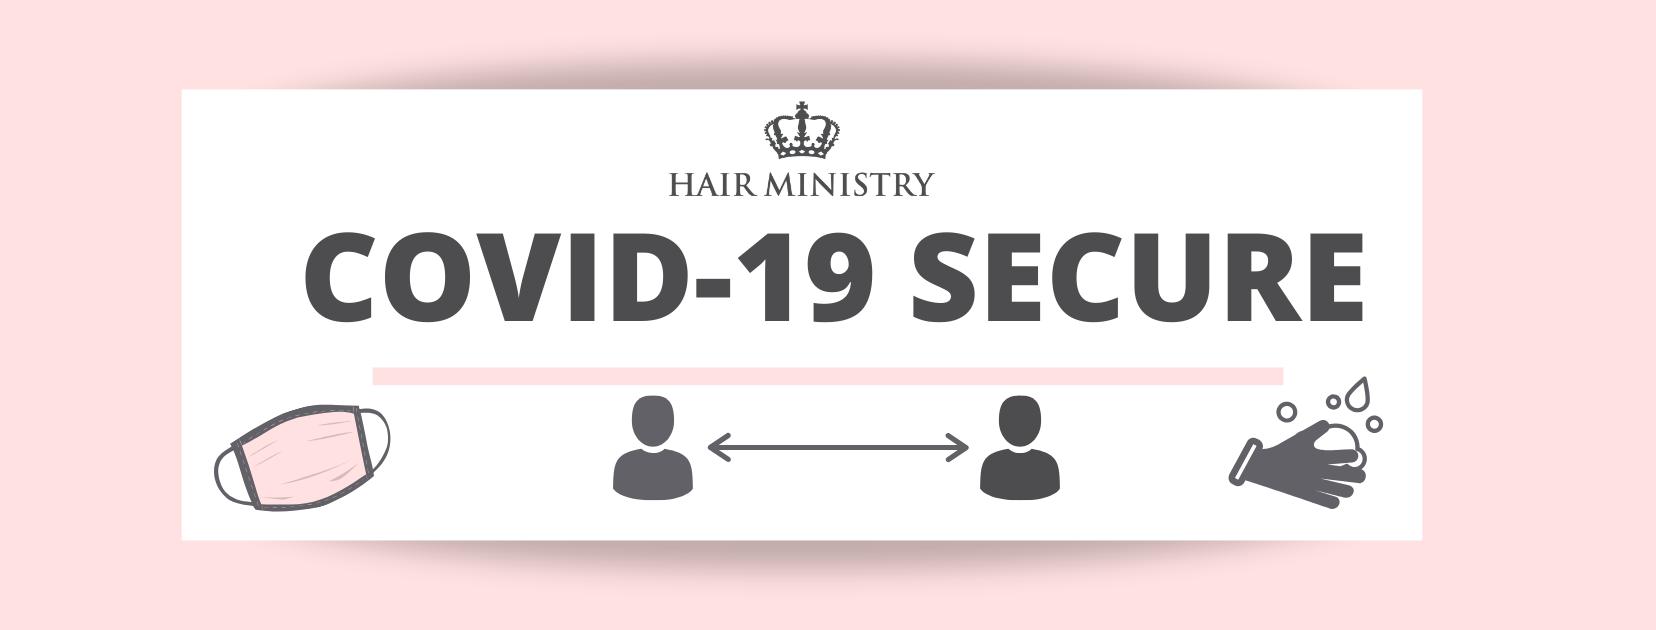 COVID 19 SECURE v2